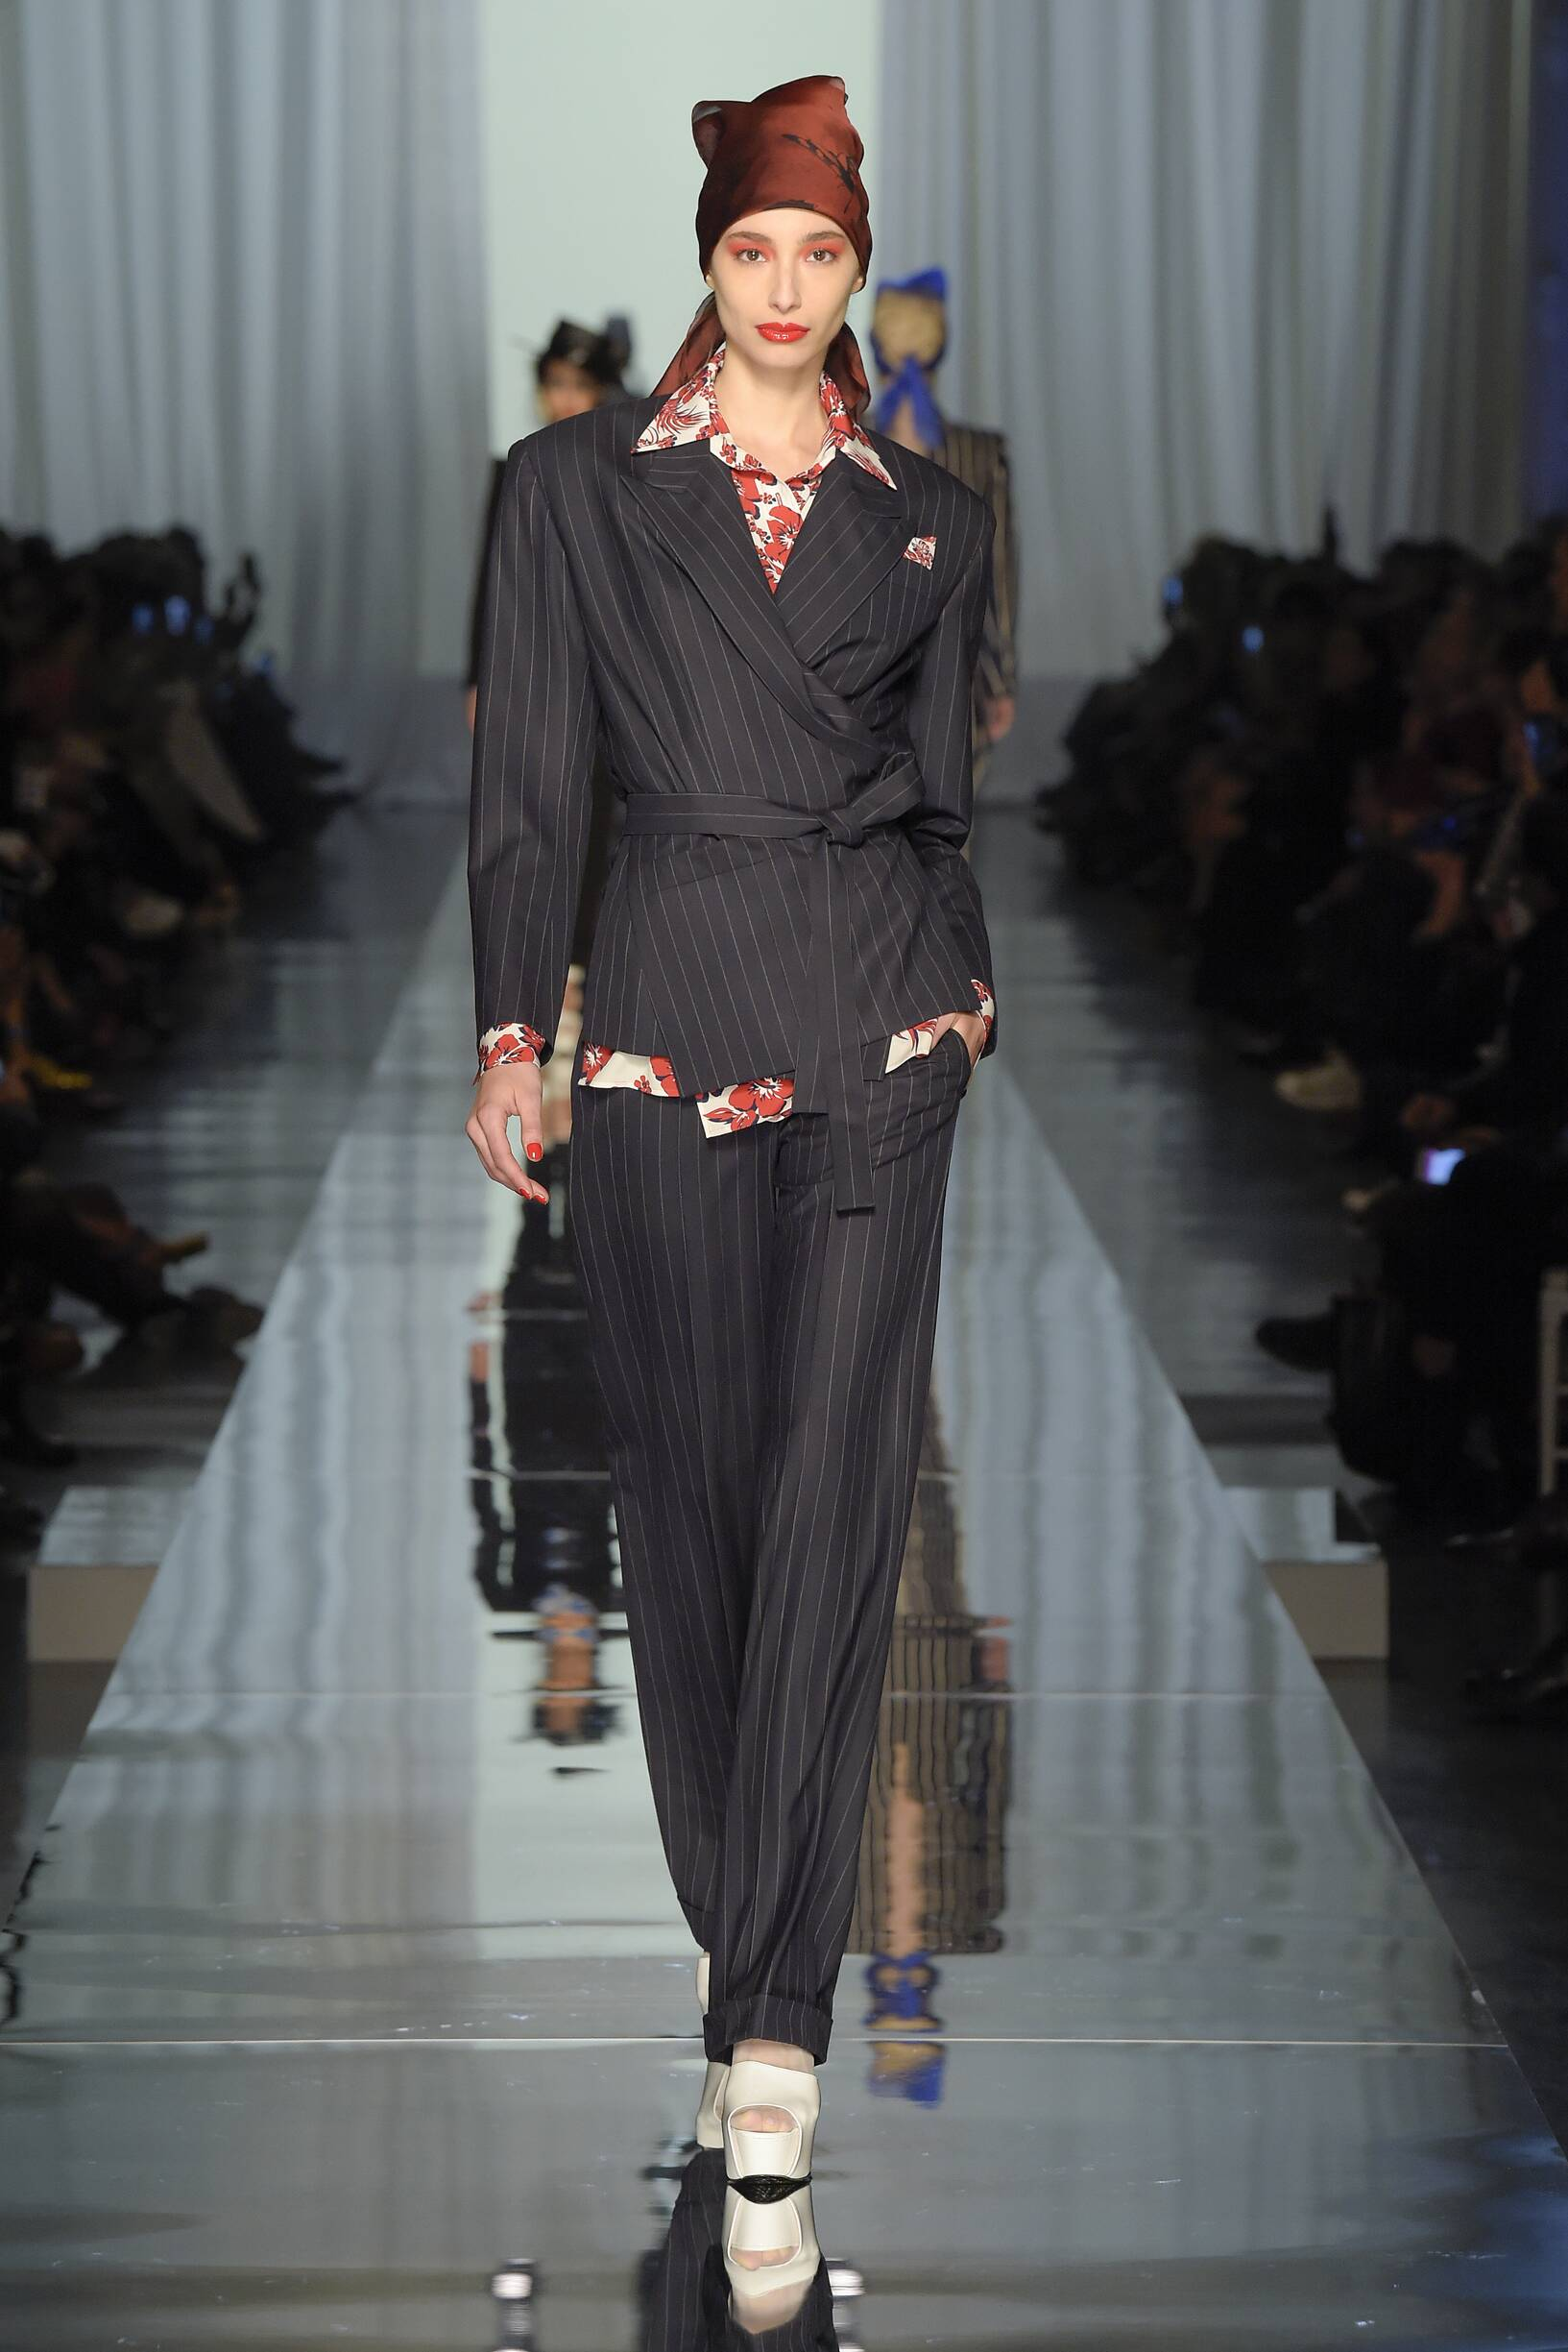 Woman SS 2017 Fashion Show Jean Paul Gaultier Haute Couture